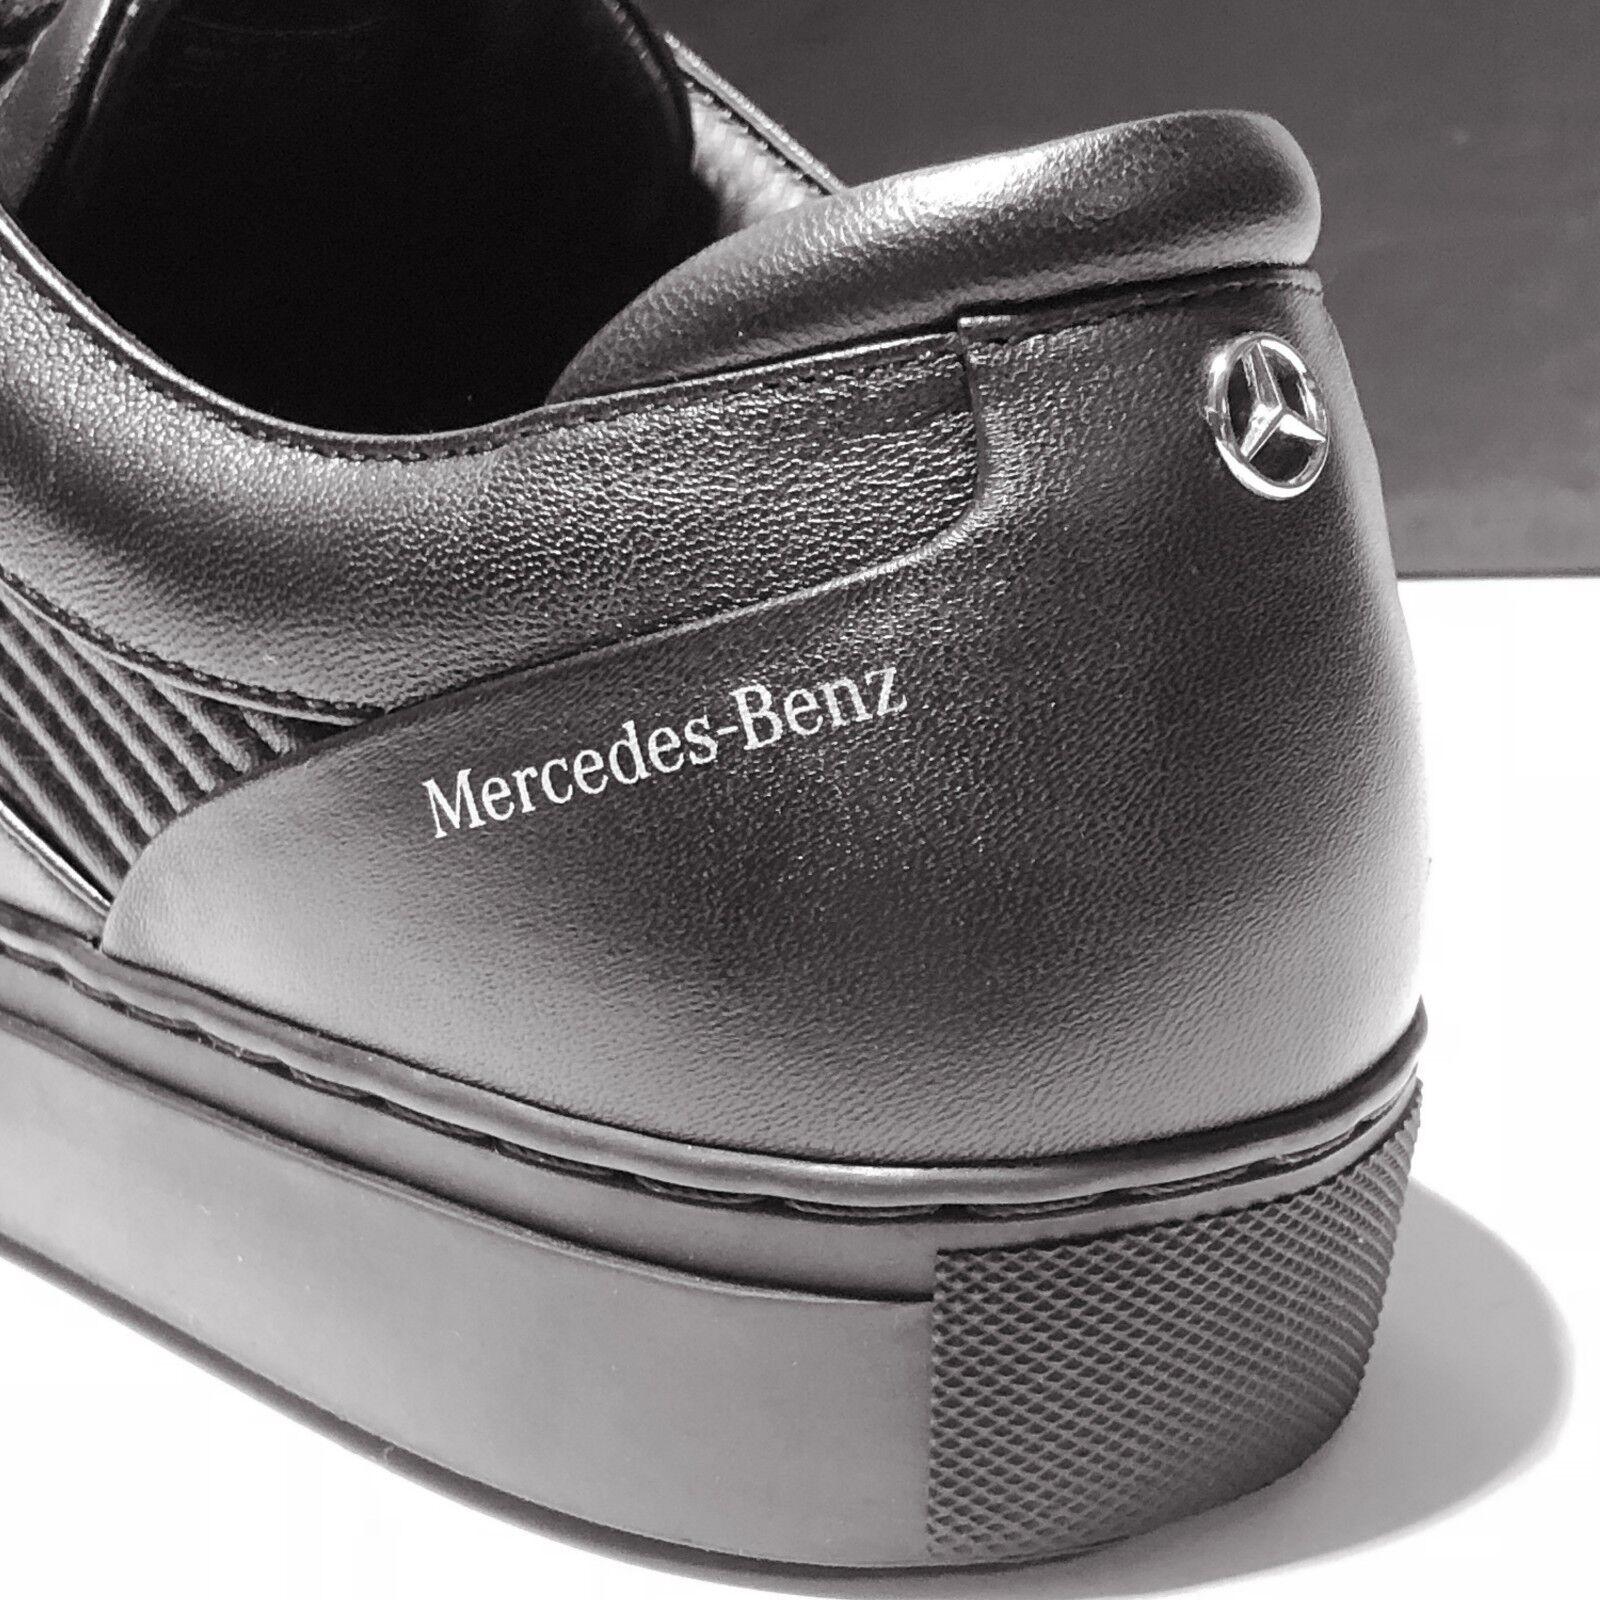 mercedes benz sko aliexpress ff931 8a3d1